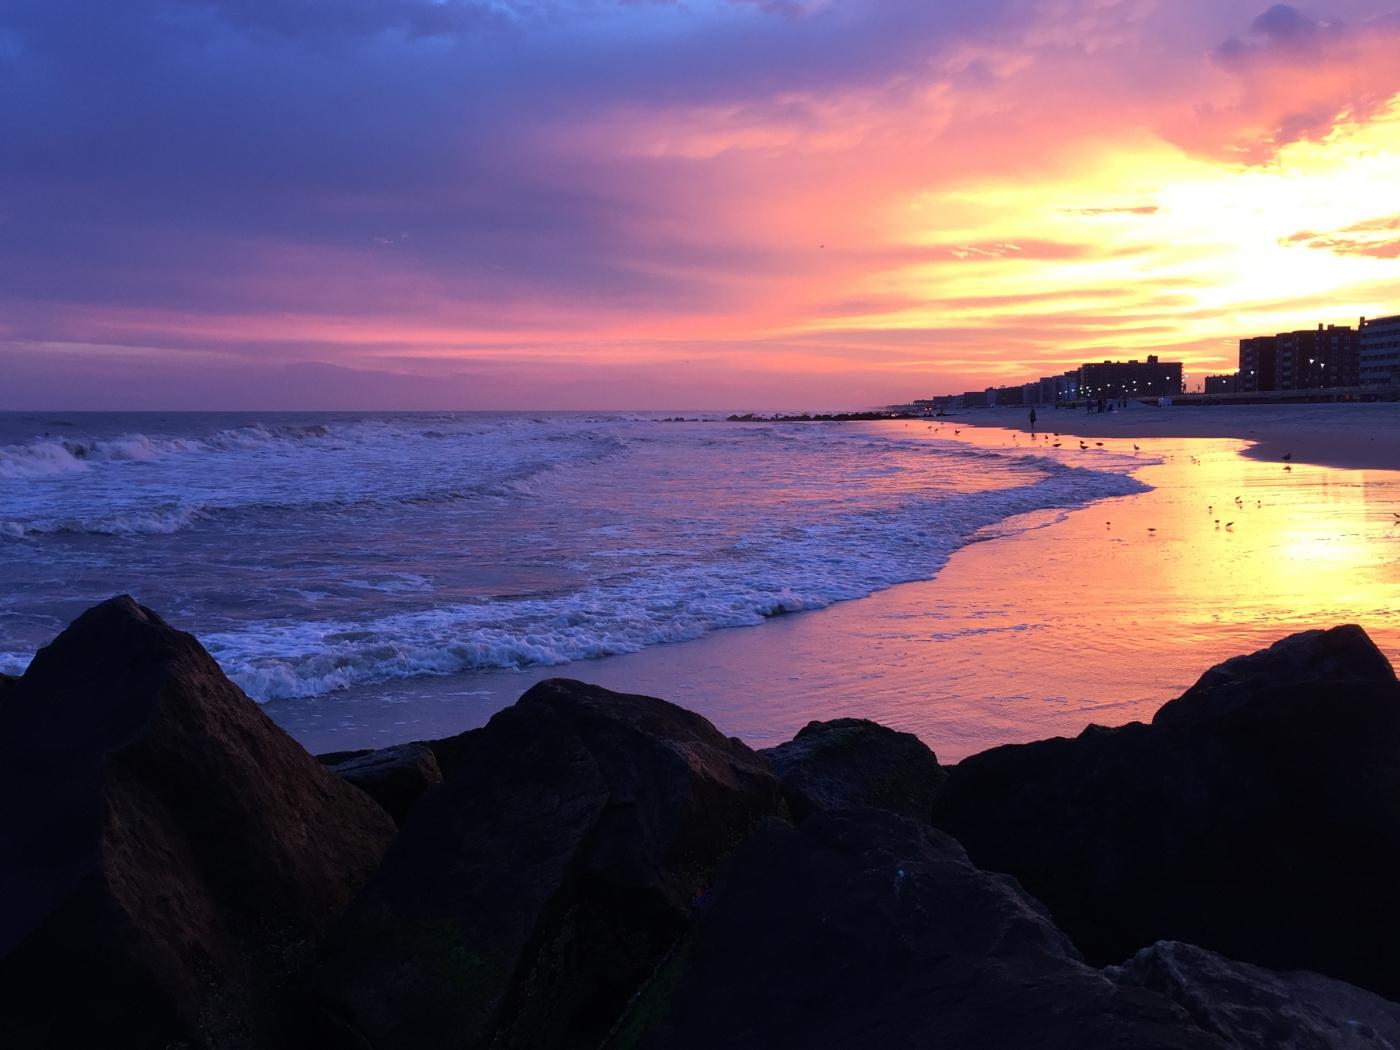 Long Beach 铺天盖地的晚霞(手机)_图1-15